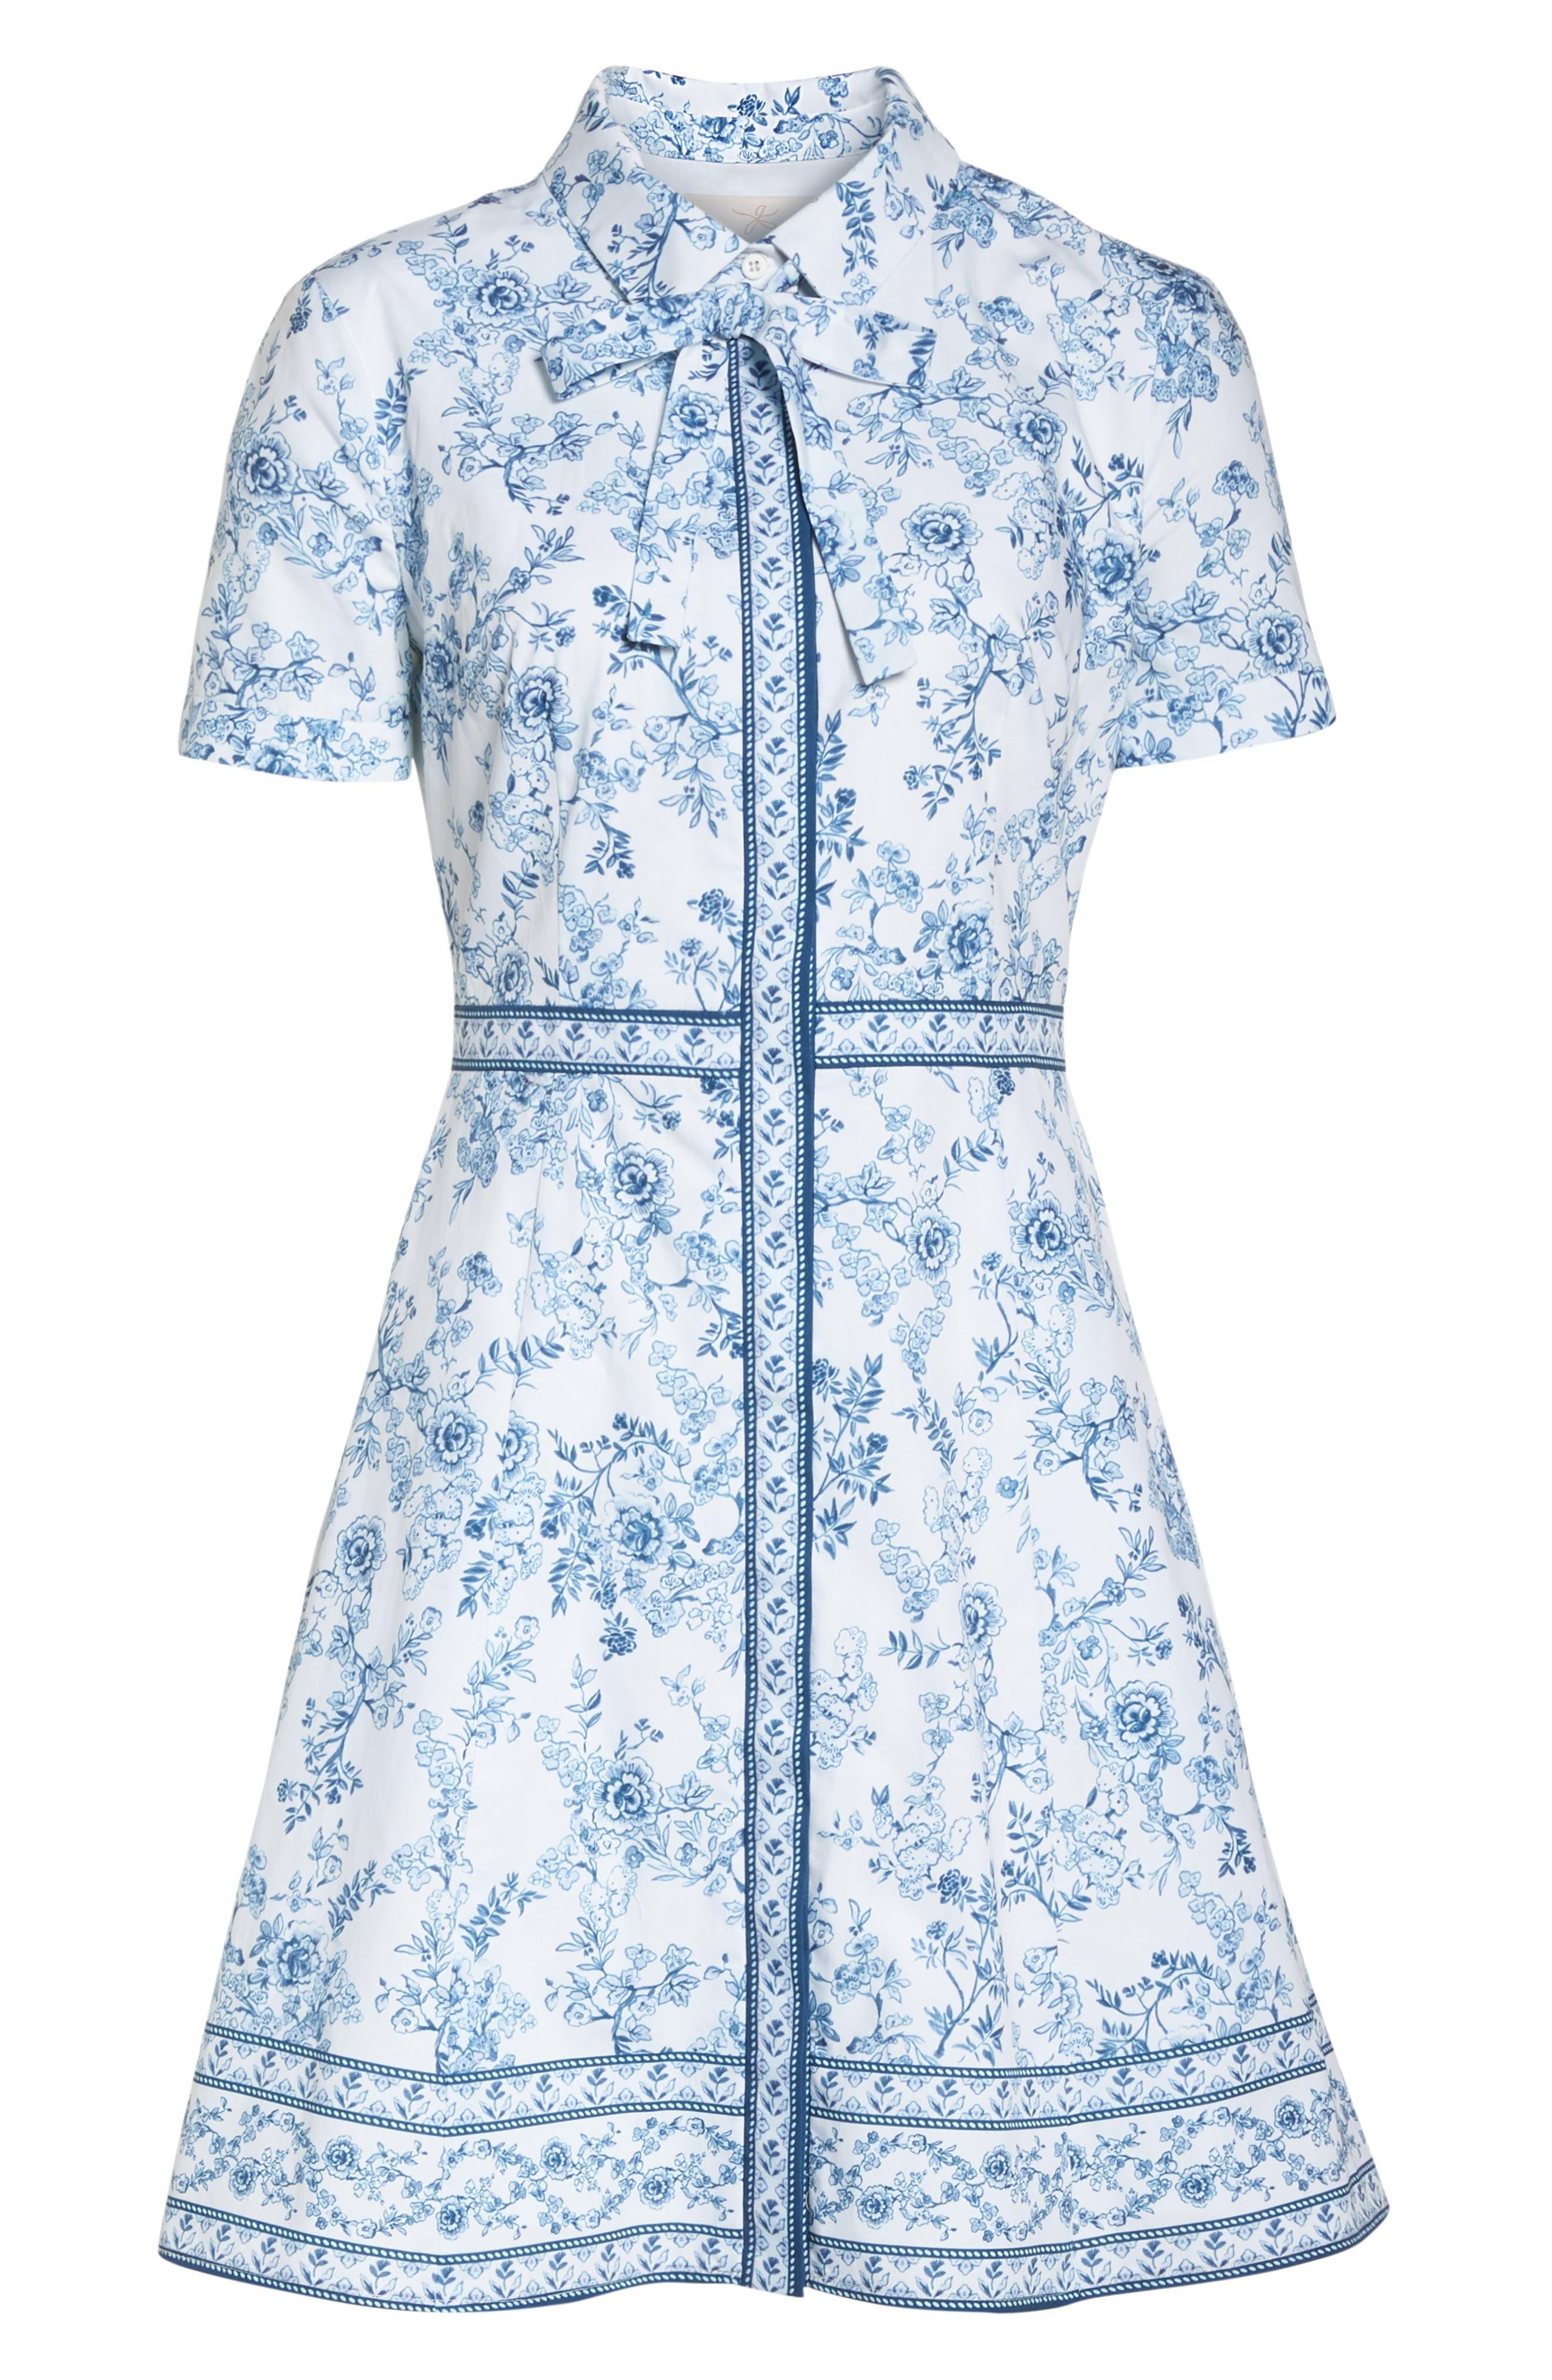 Darla Cotton Toile Shirtdress,                             Alternate thumbnail 8, color,                             Cloud/ Cornflower